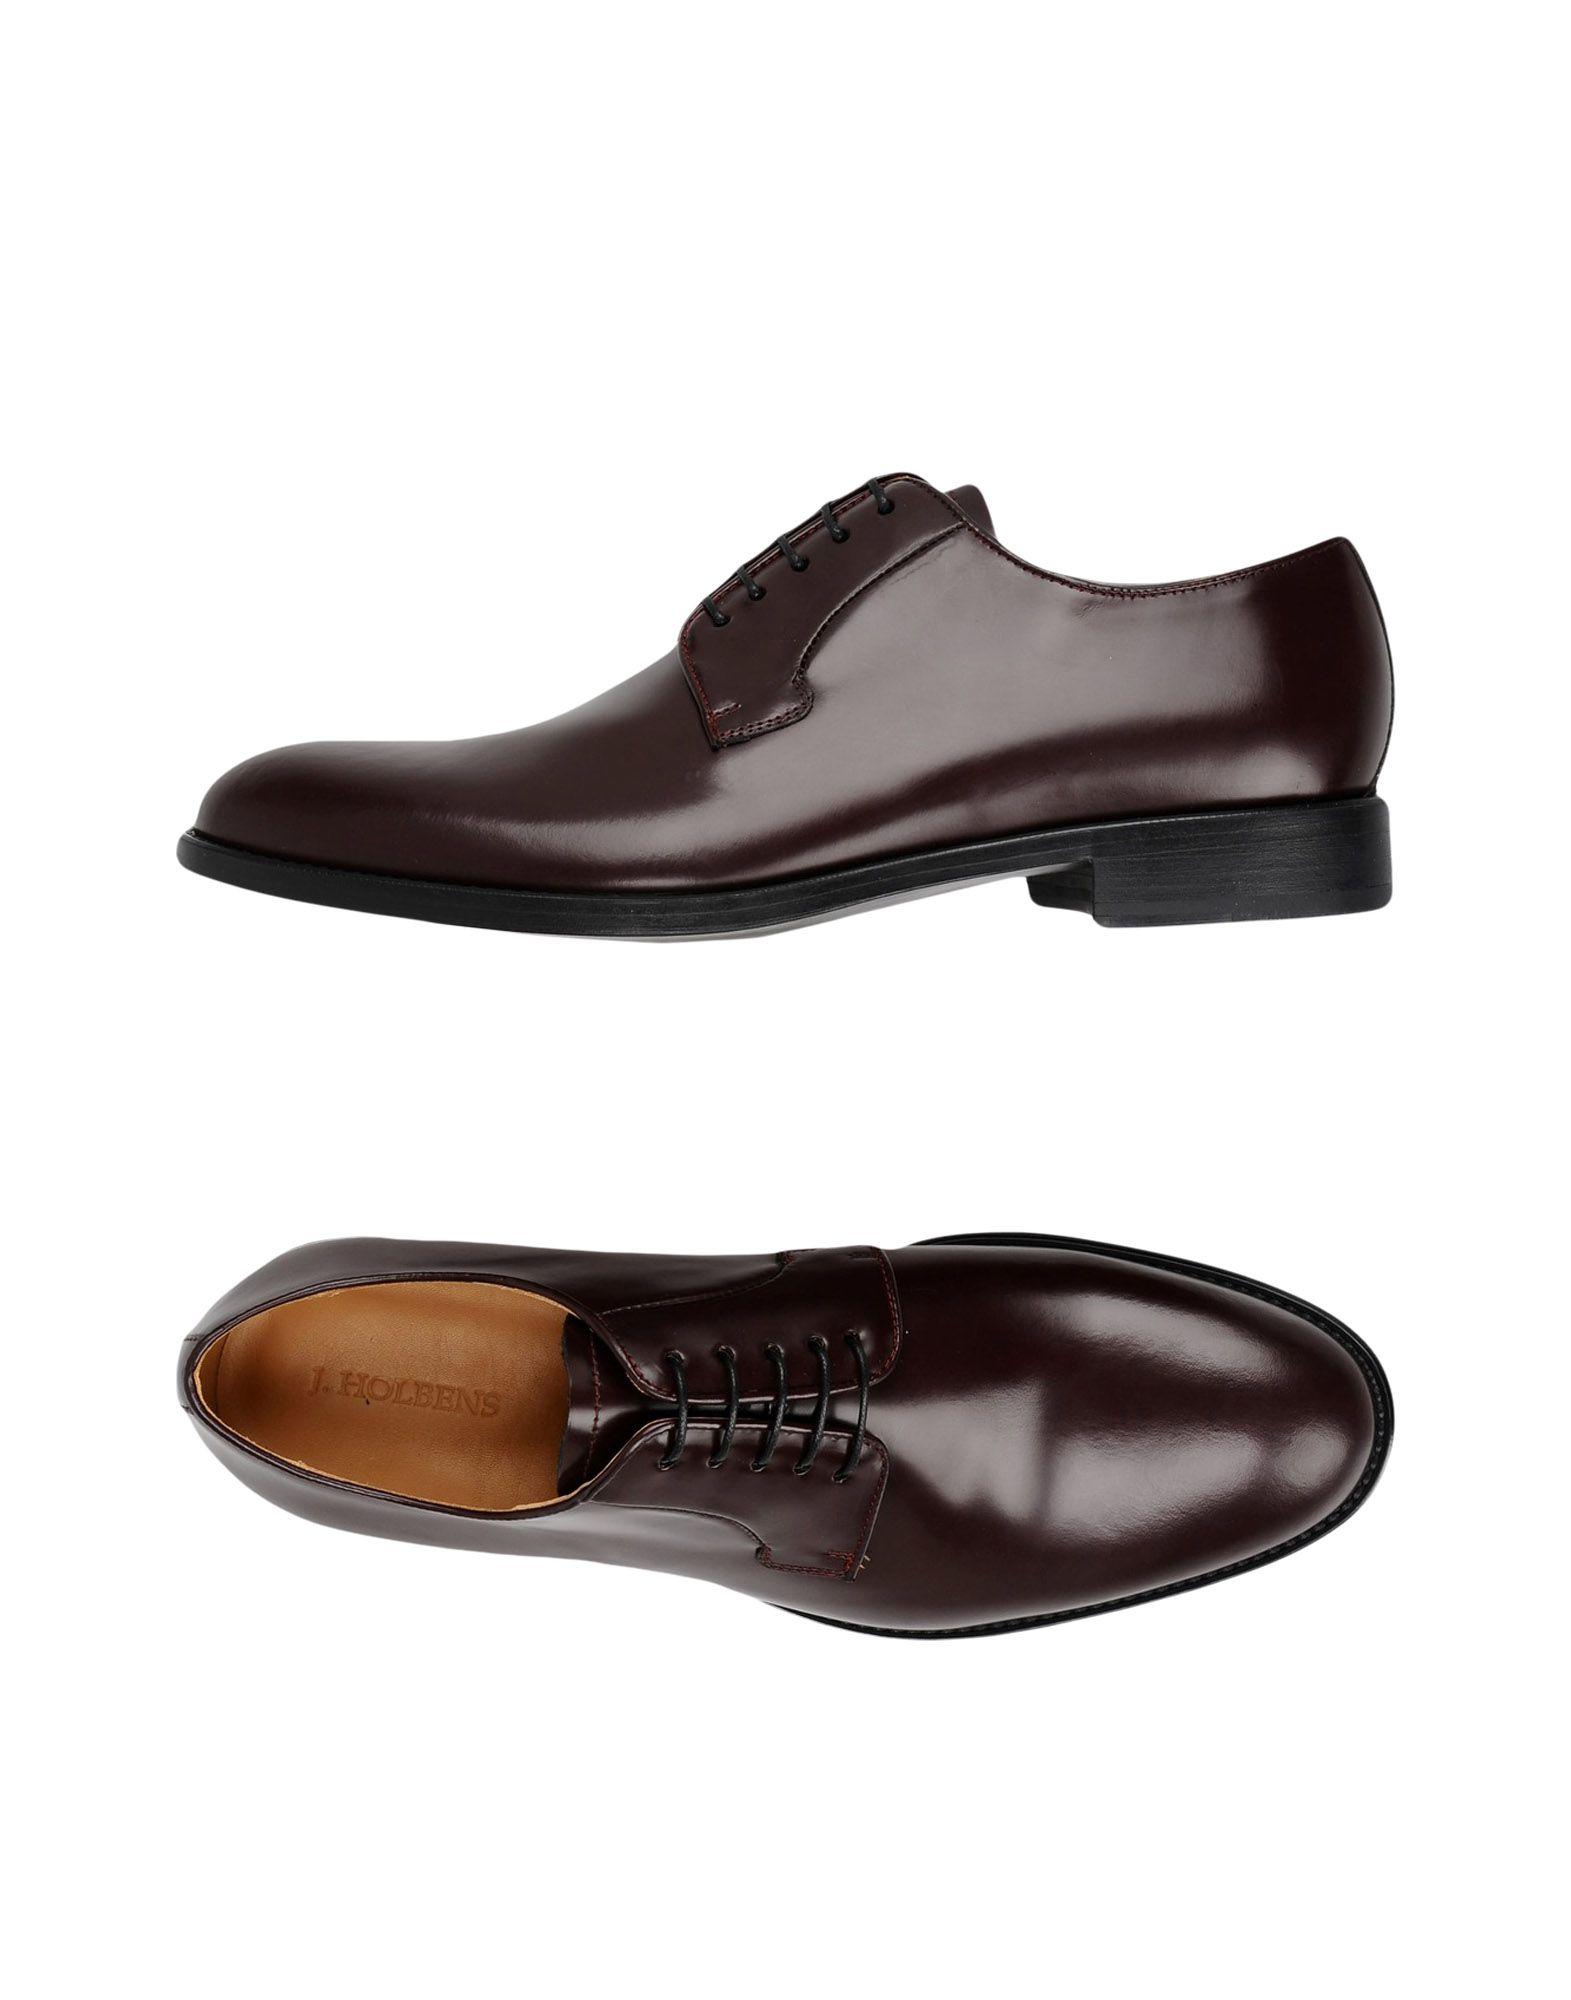 J. Holbens  A22  Holbens 11425752GK Heiße Schuhe 3b313a